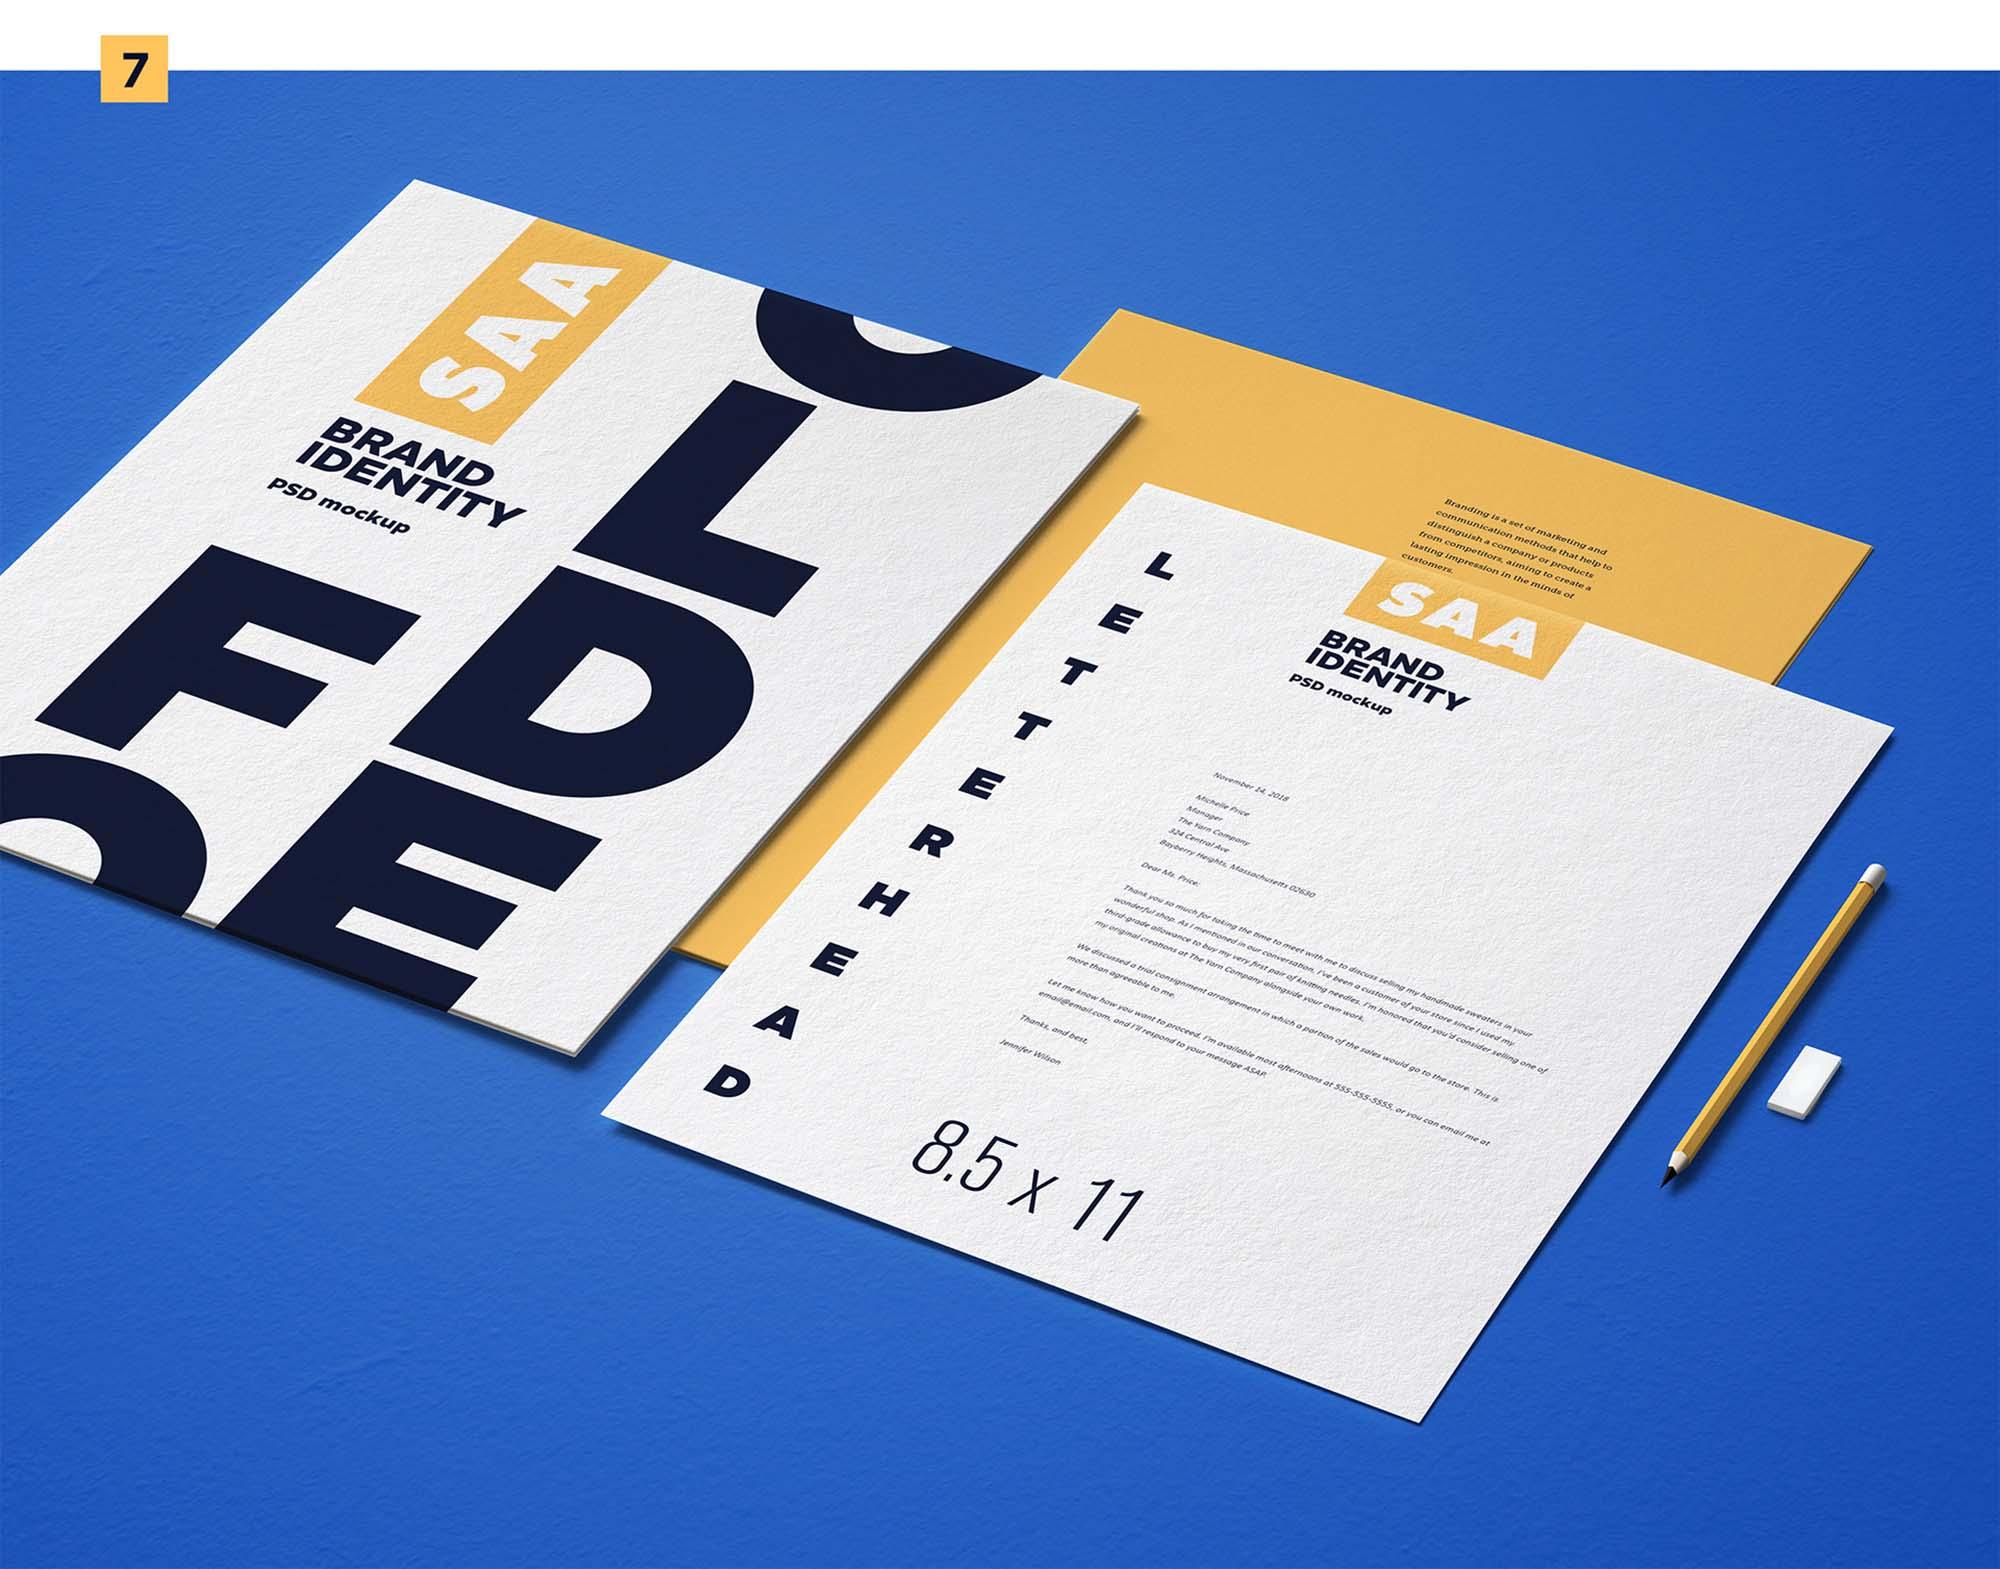 Identity Design Mockup 7